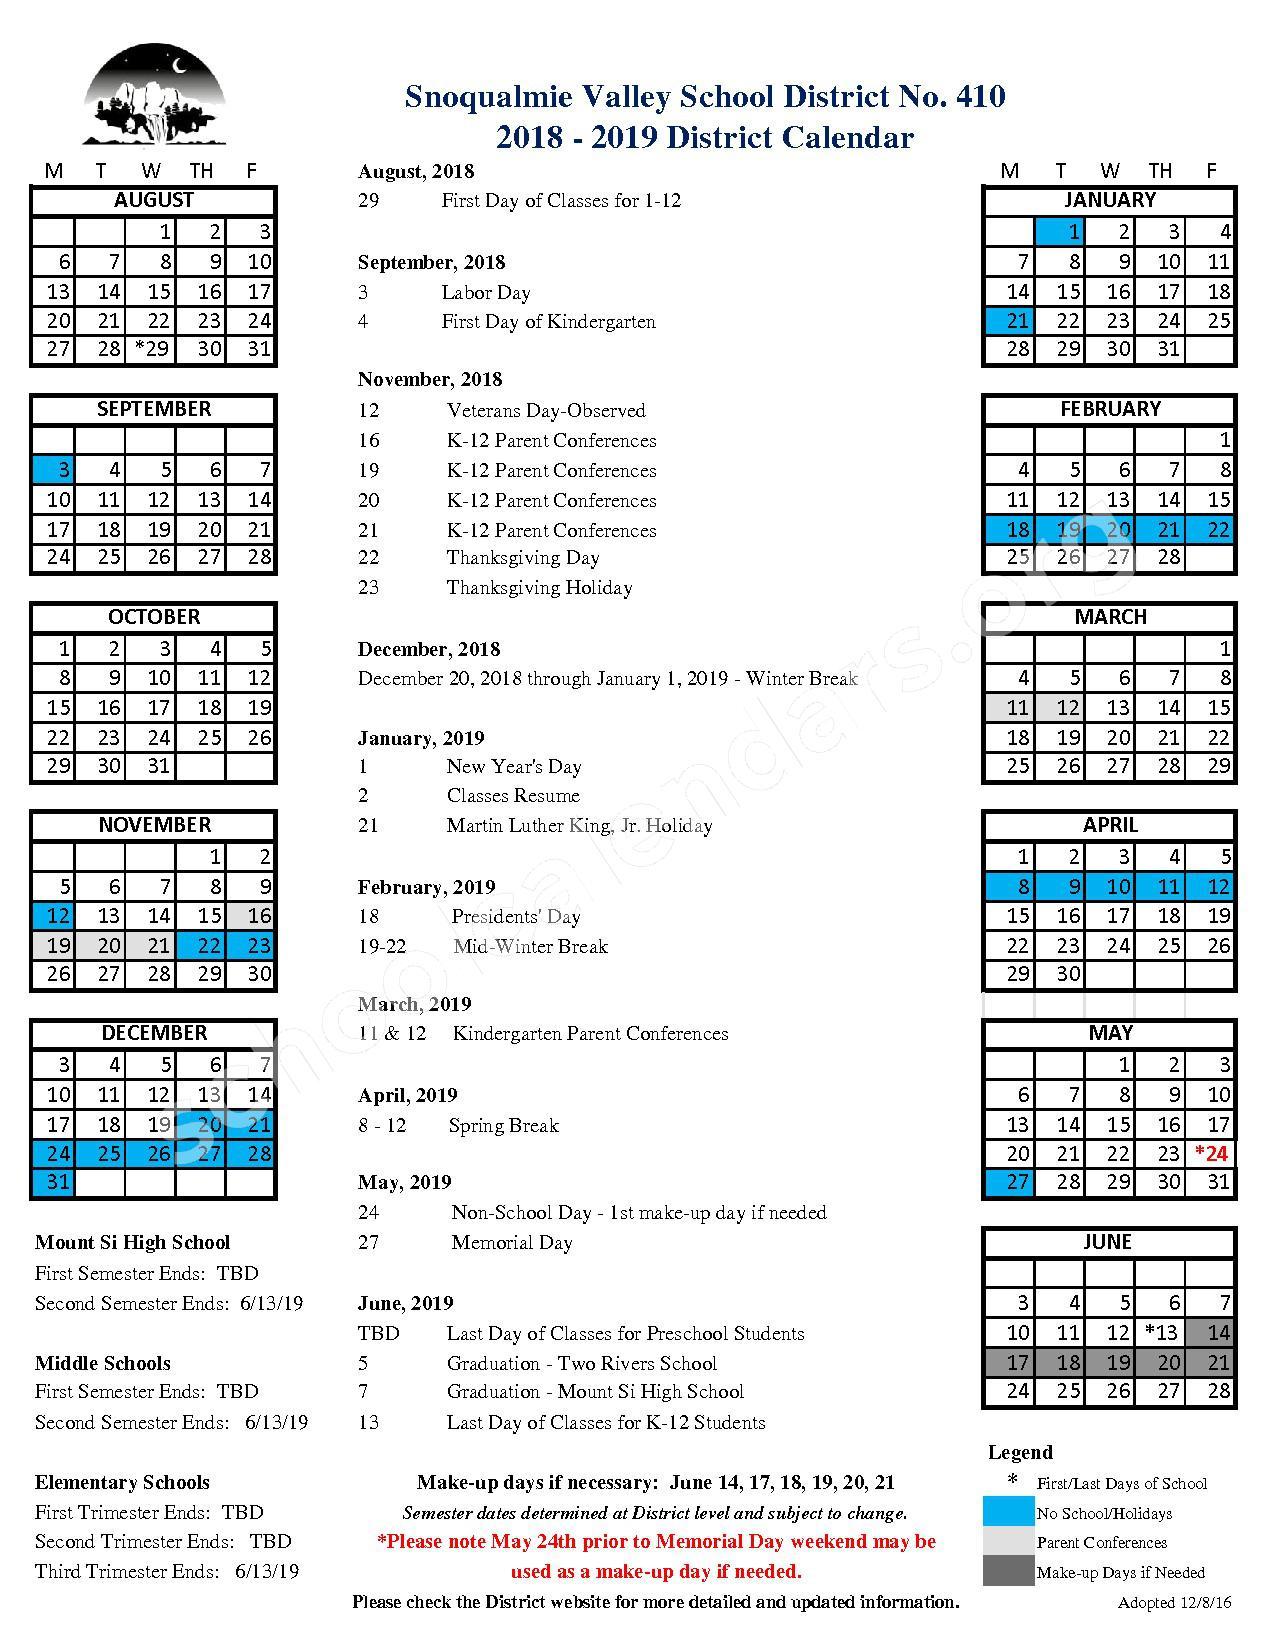 2018 - 2019 District Calendar – Snoqualmie Valley School District – page 1